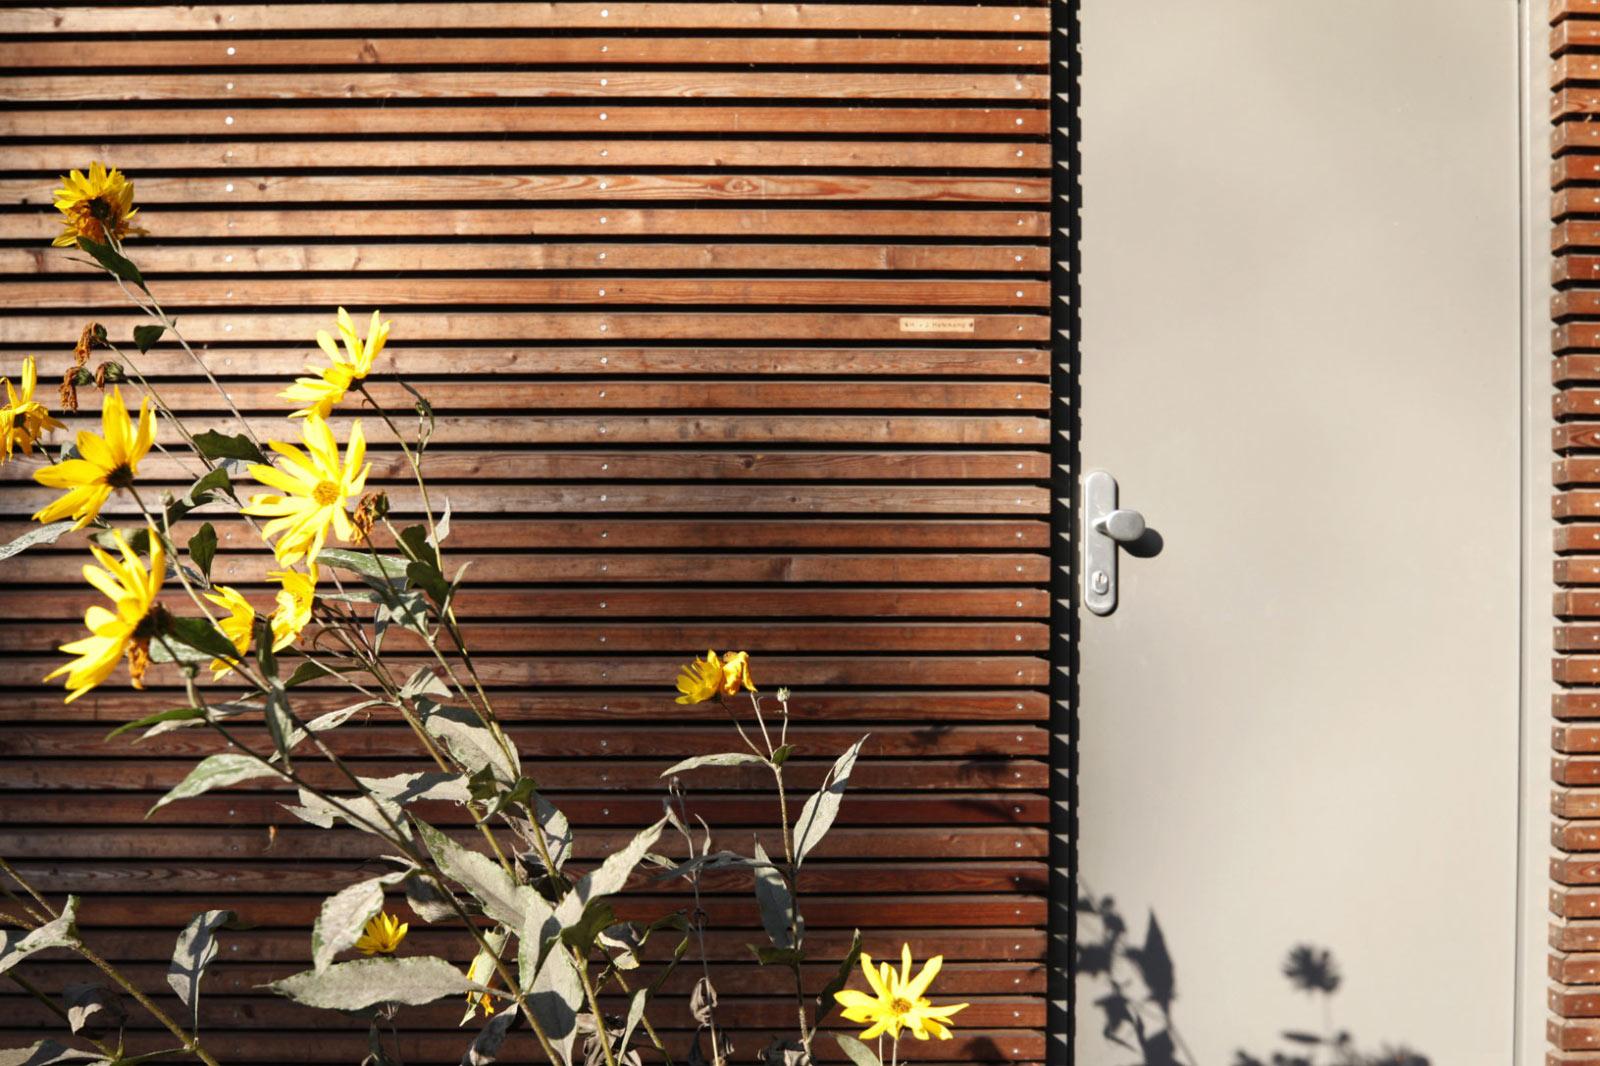 Eingang und Lärchenholzfassade am Designholzhaus in Fertigbauweise